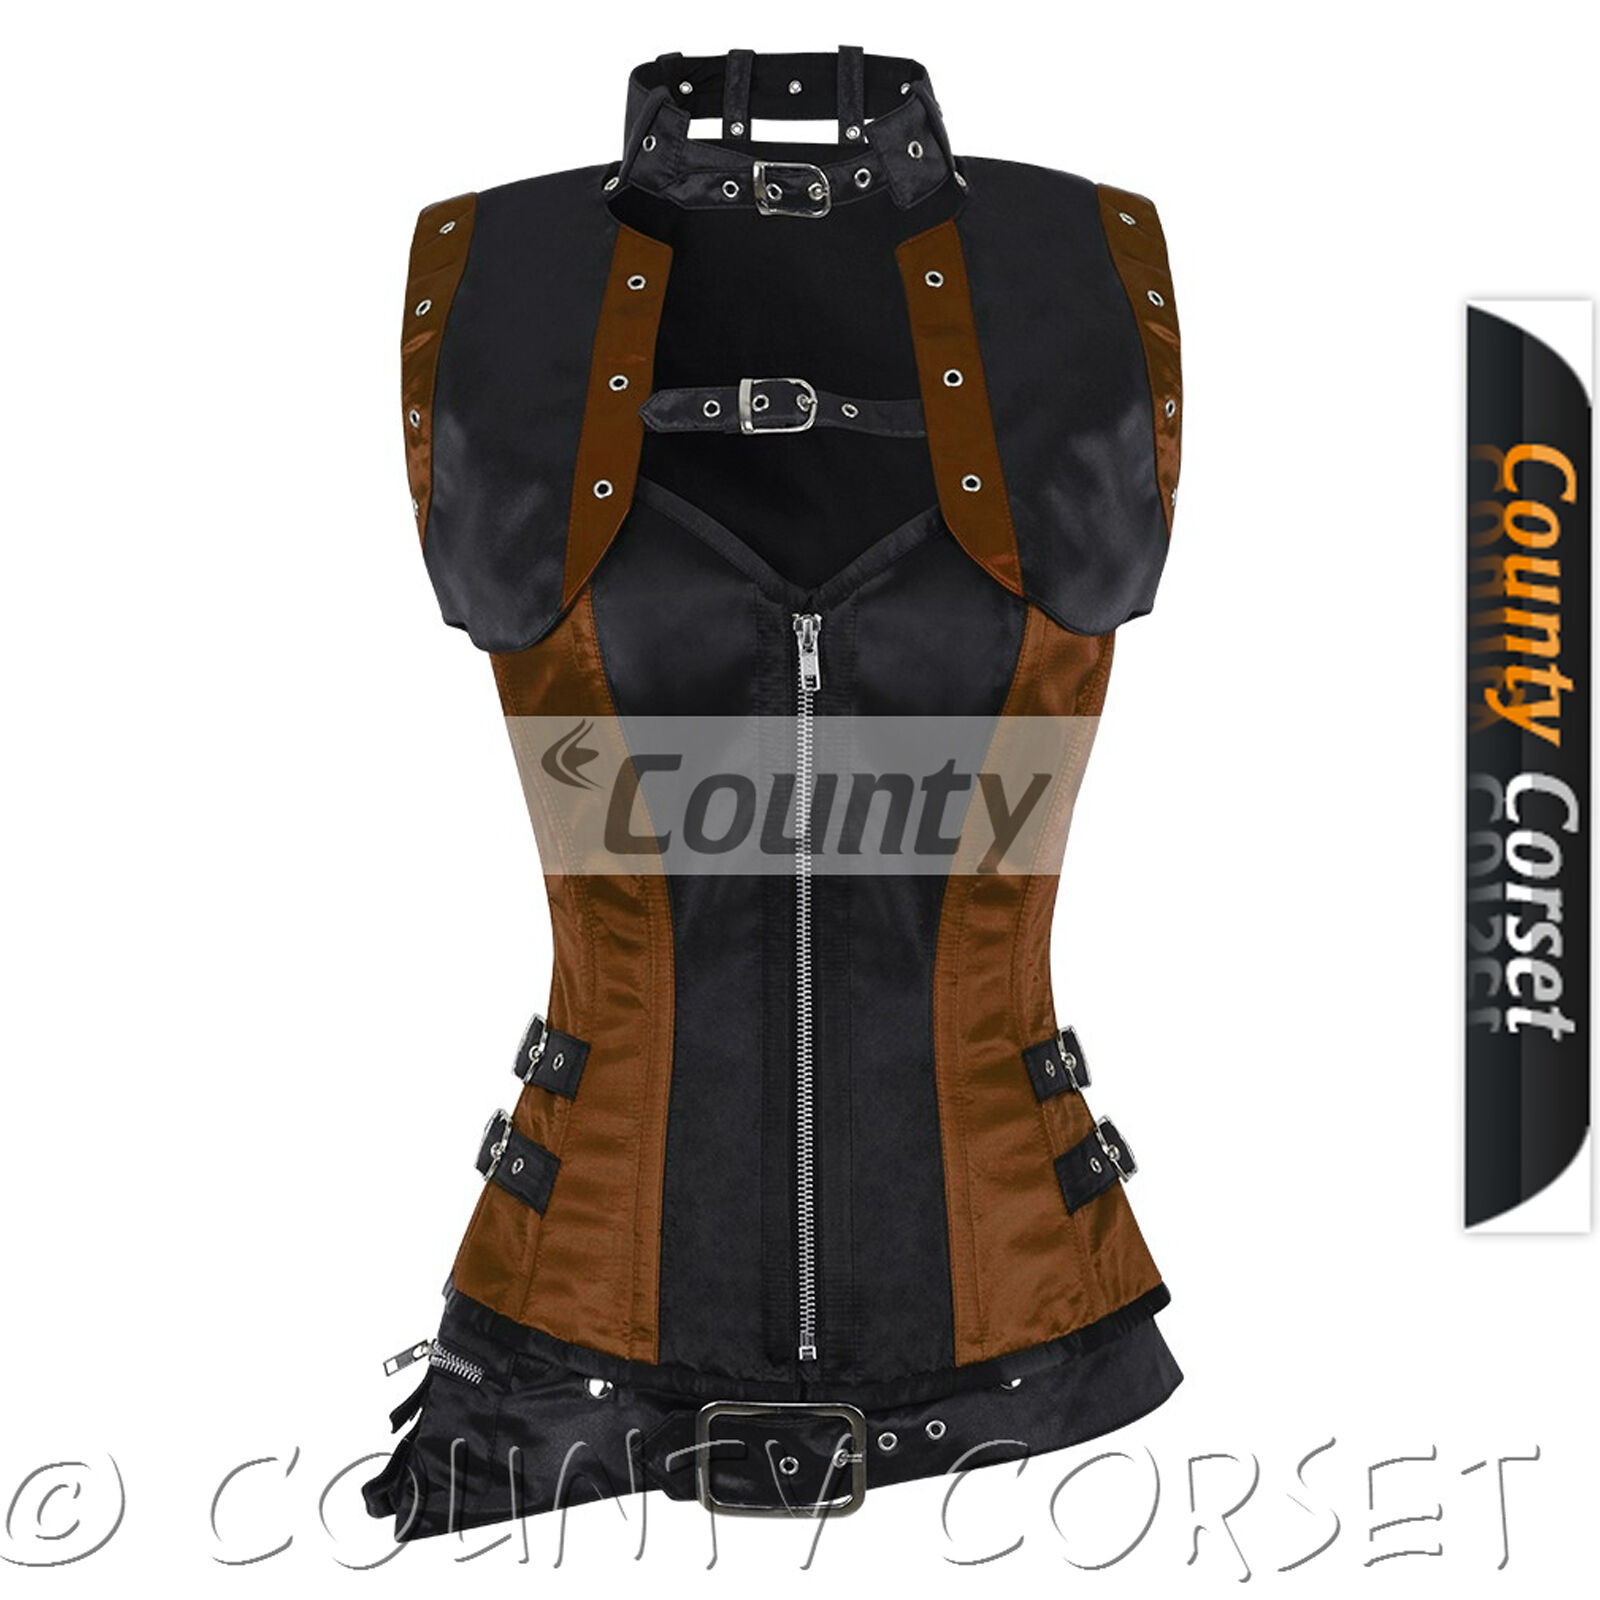 Steampunk Overbust Gothic os en acier complète schwarz braun veste boléro satin corset